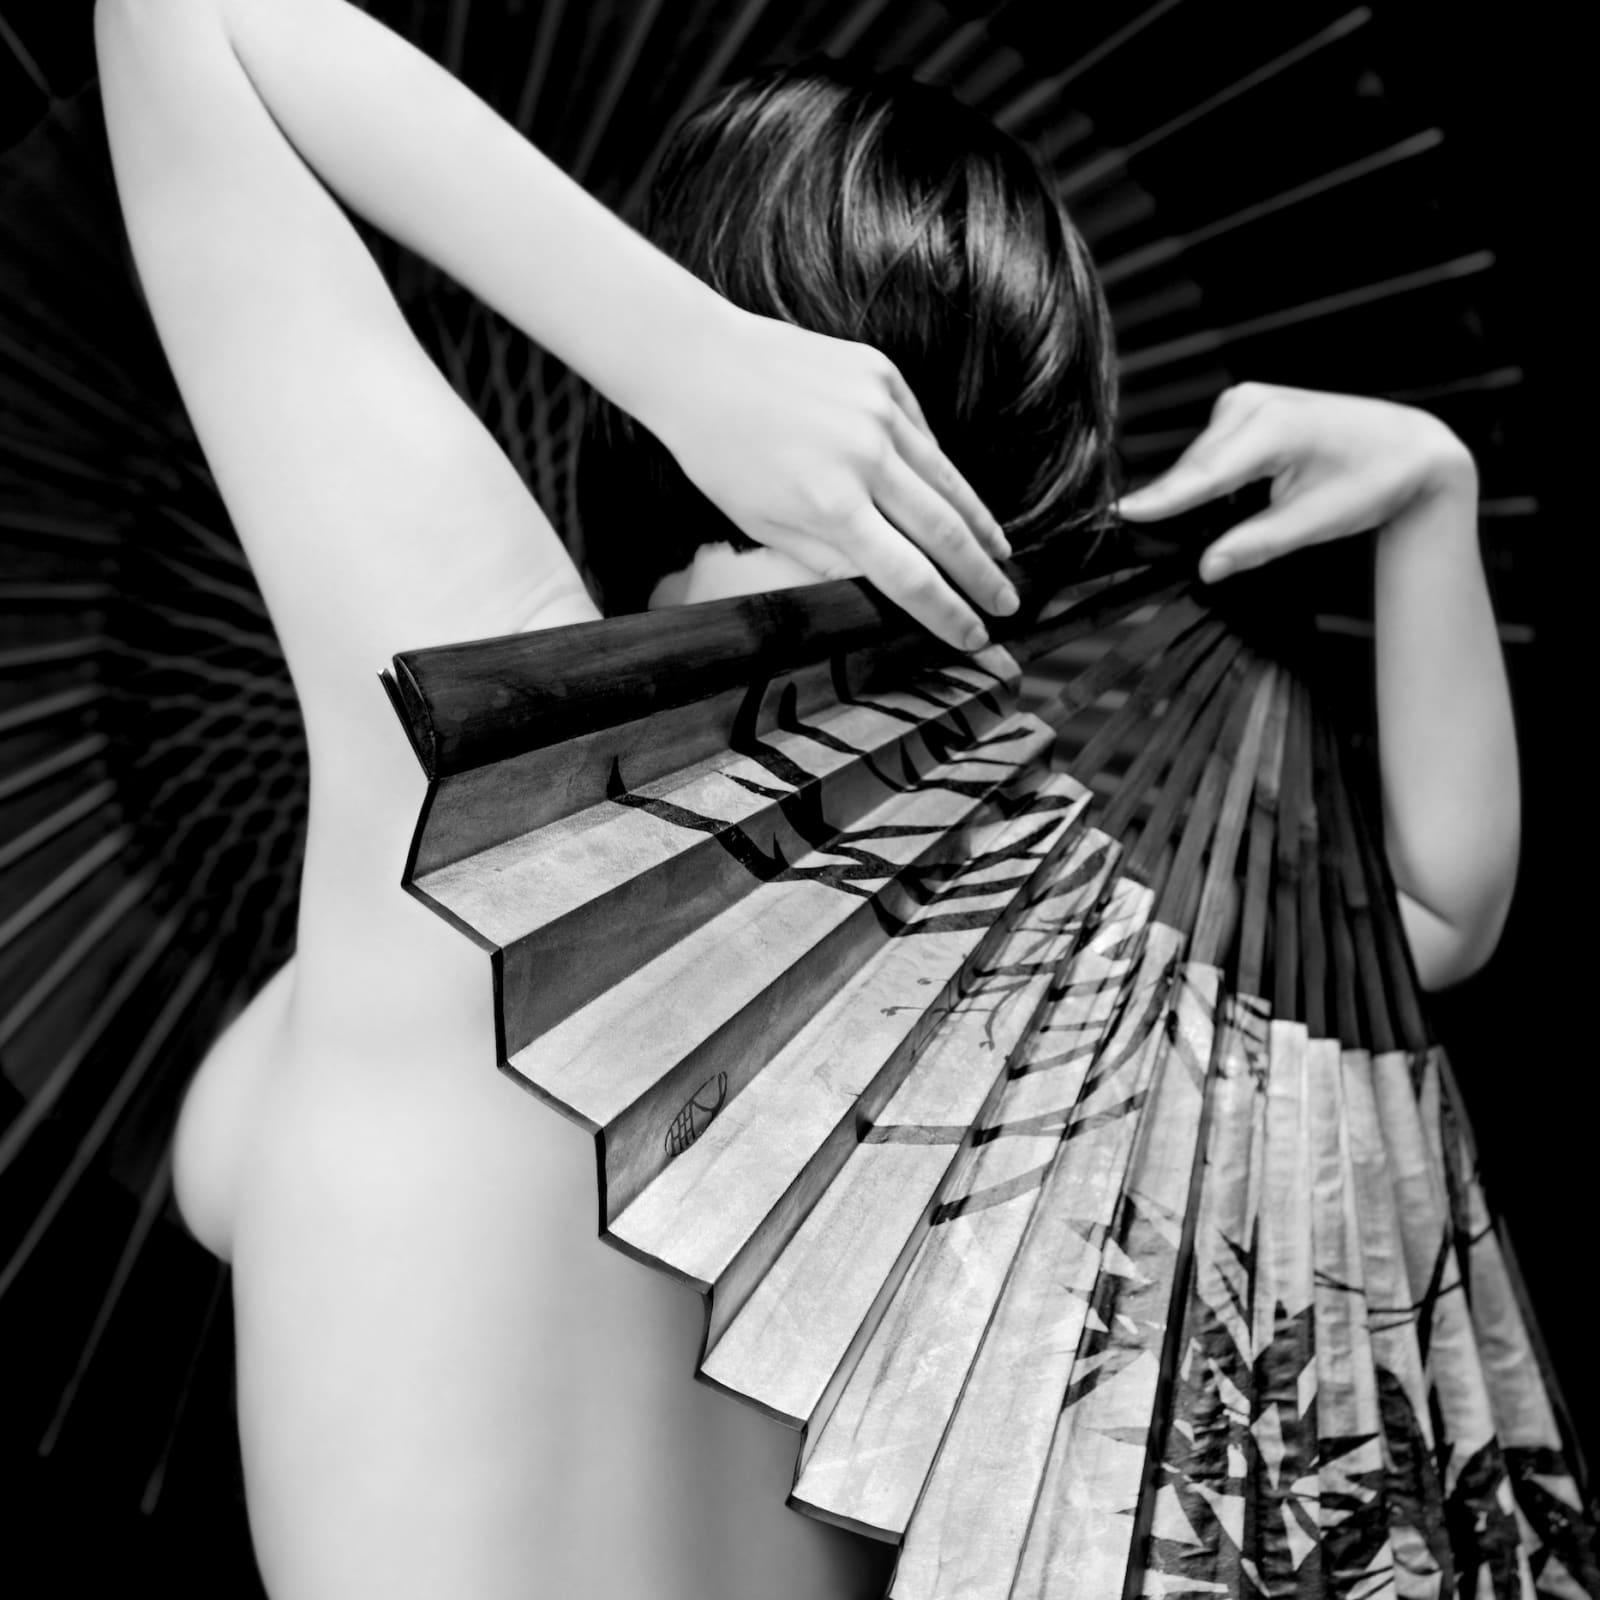 Maryam Eisler  Wildcat Hill IV, 2018  Platinum Print on Arches Platine Paper  57 x 76 cm  Edition of 5